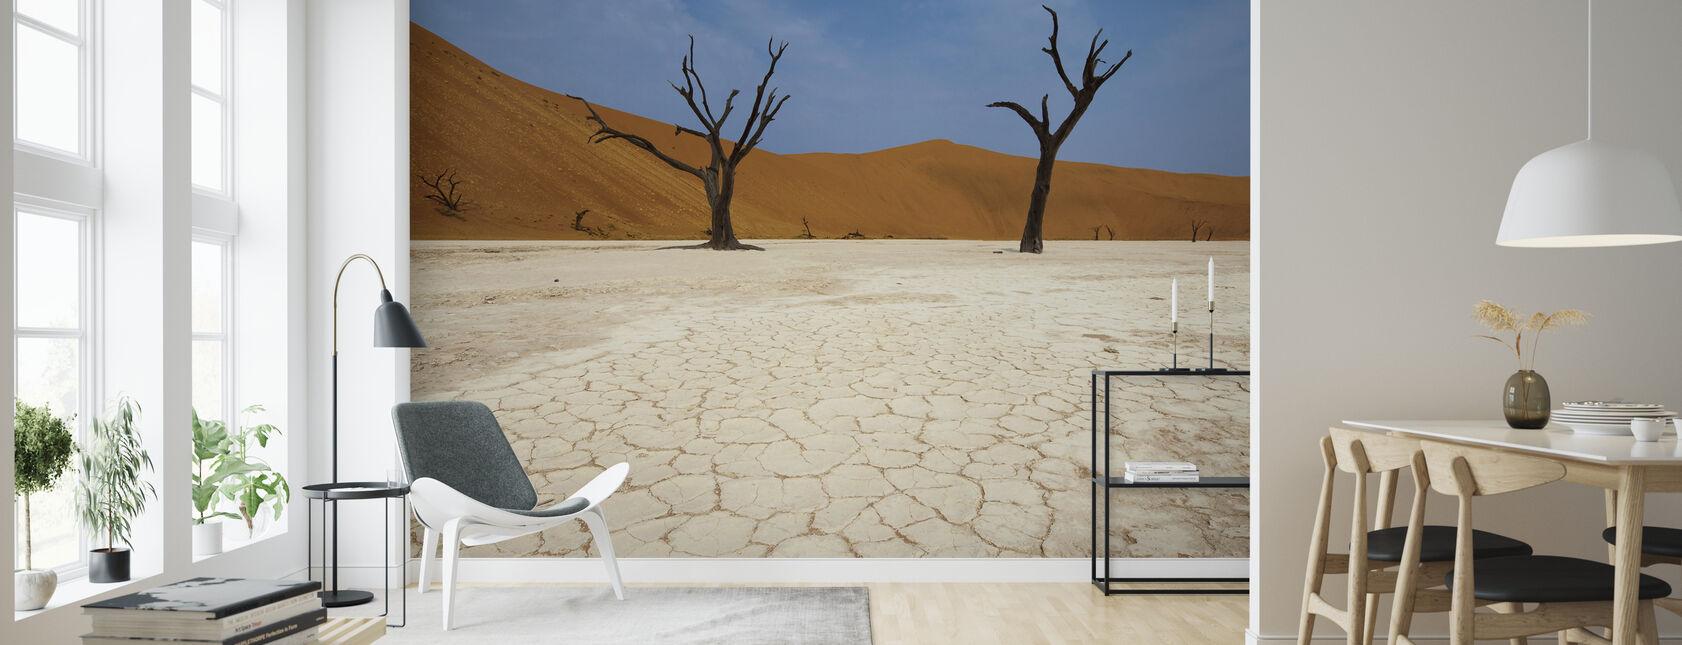 Deadvlei, Namibia - Tapet - Stue